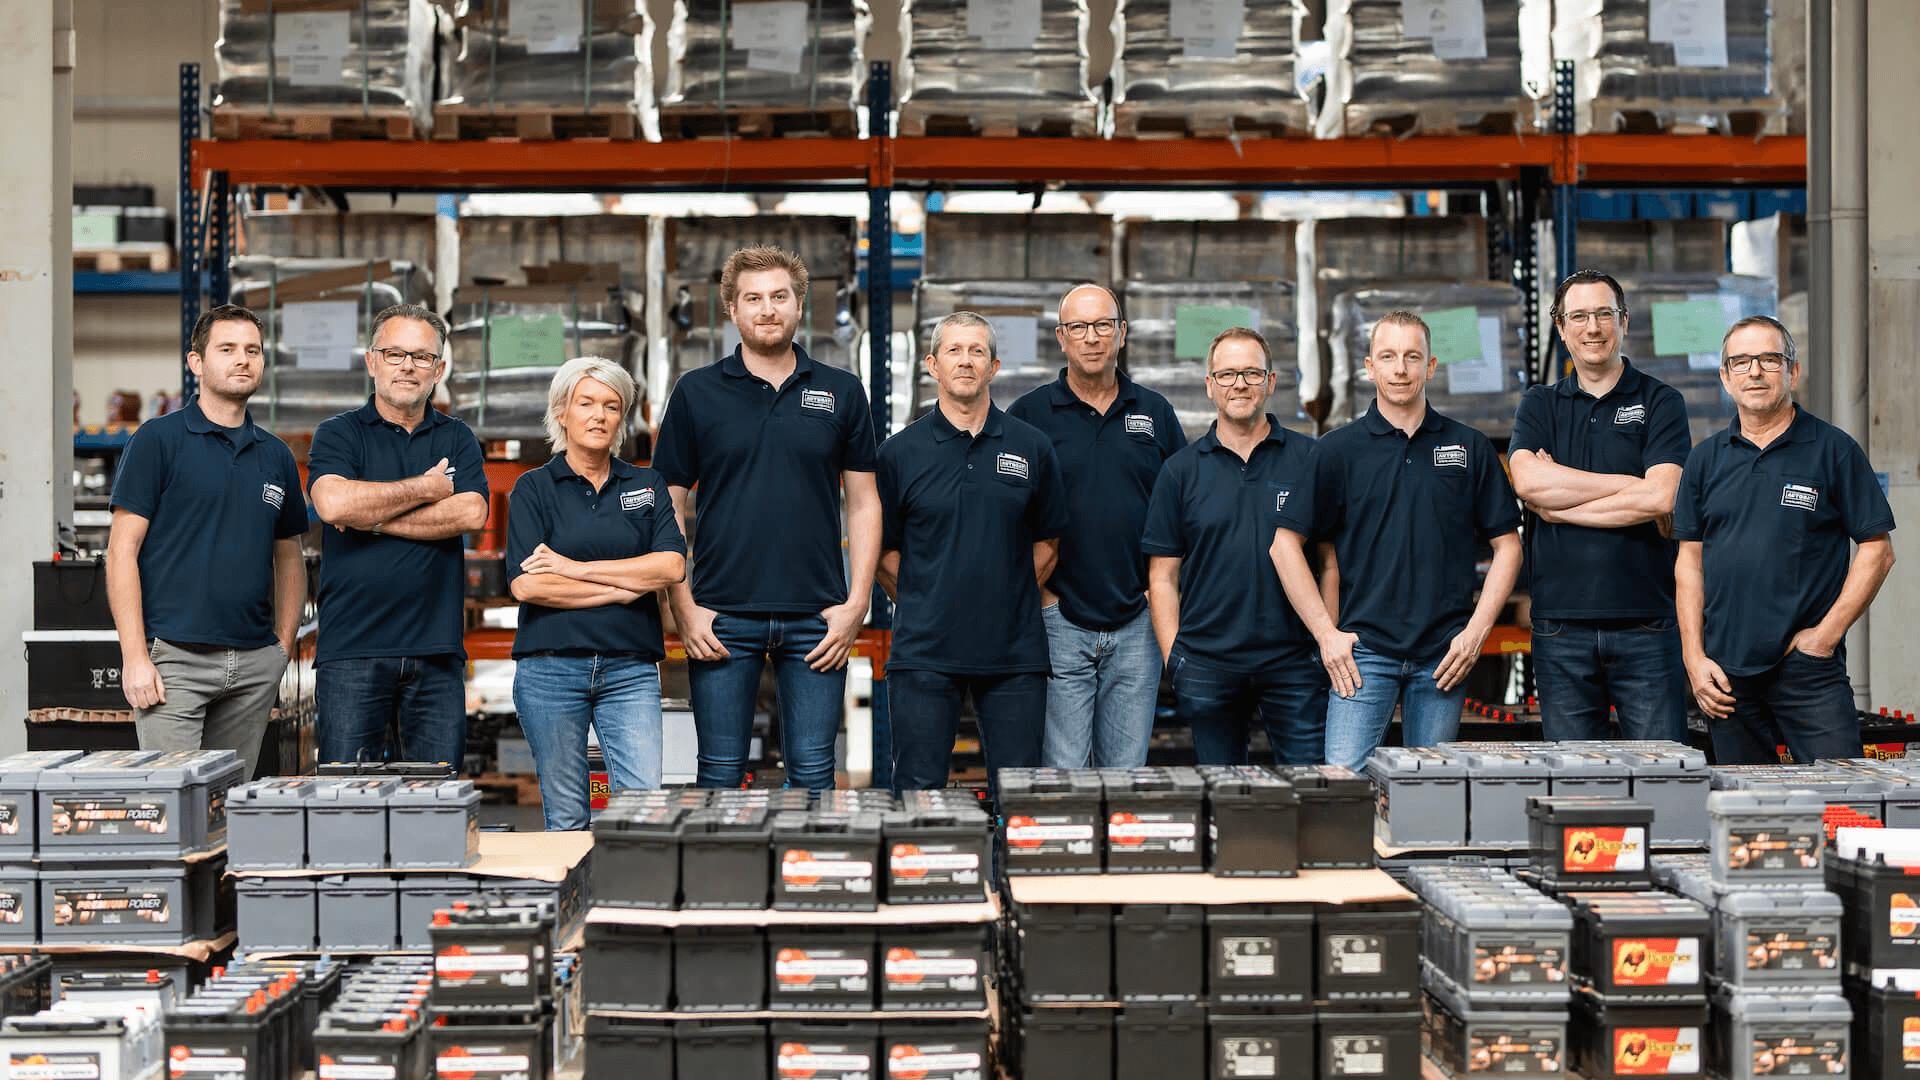 Groepsfoto van het Autobat team.